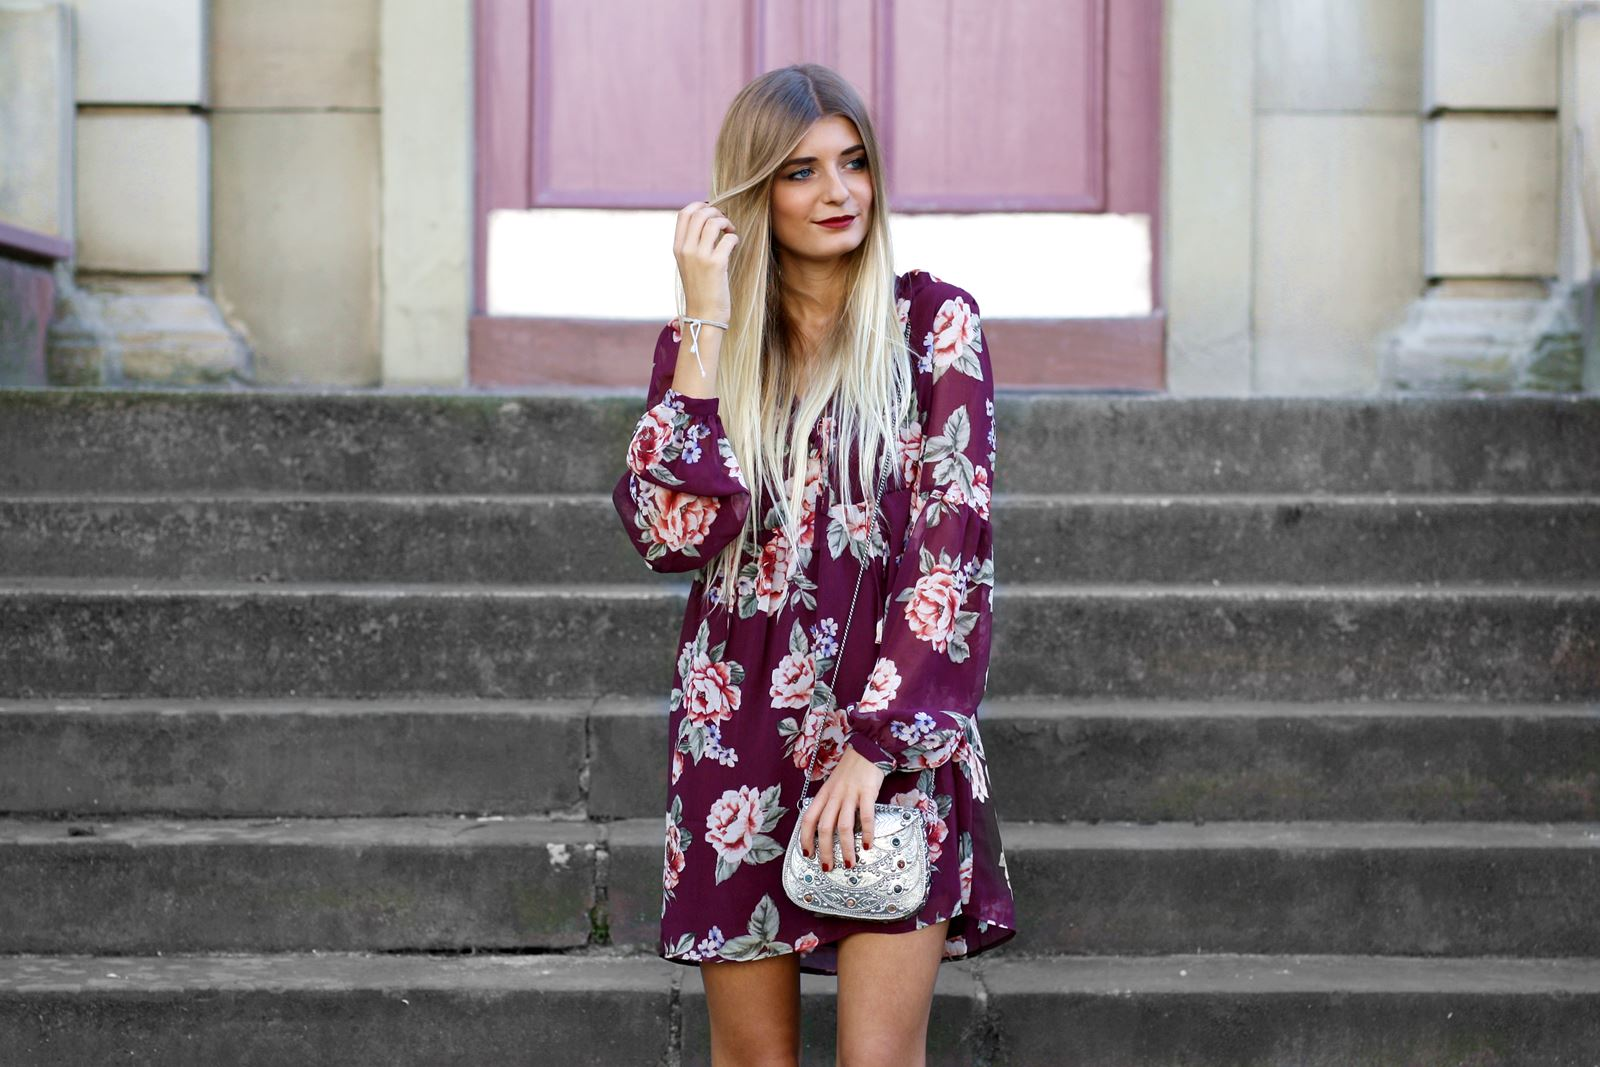 modeblog-german-fashion-blog-outfit-stiefeletten-rotes-blumenkleid-7